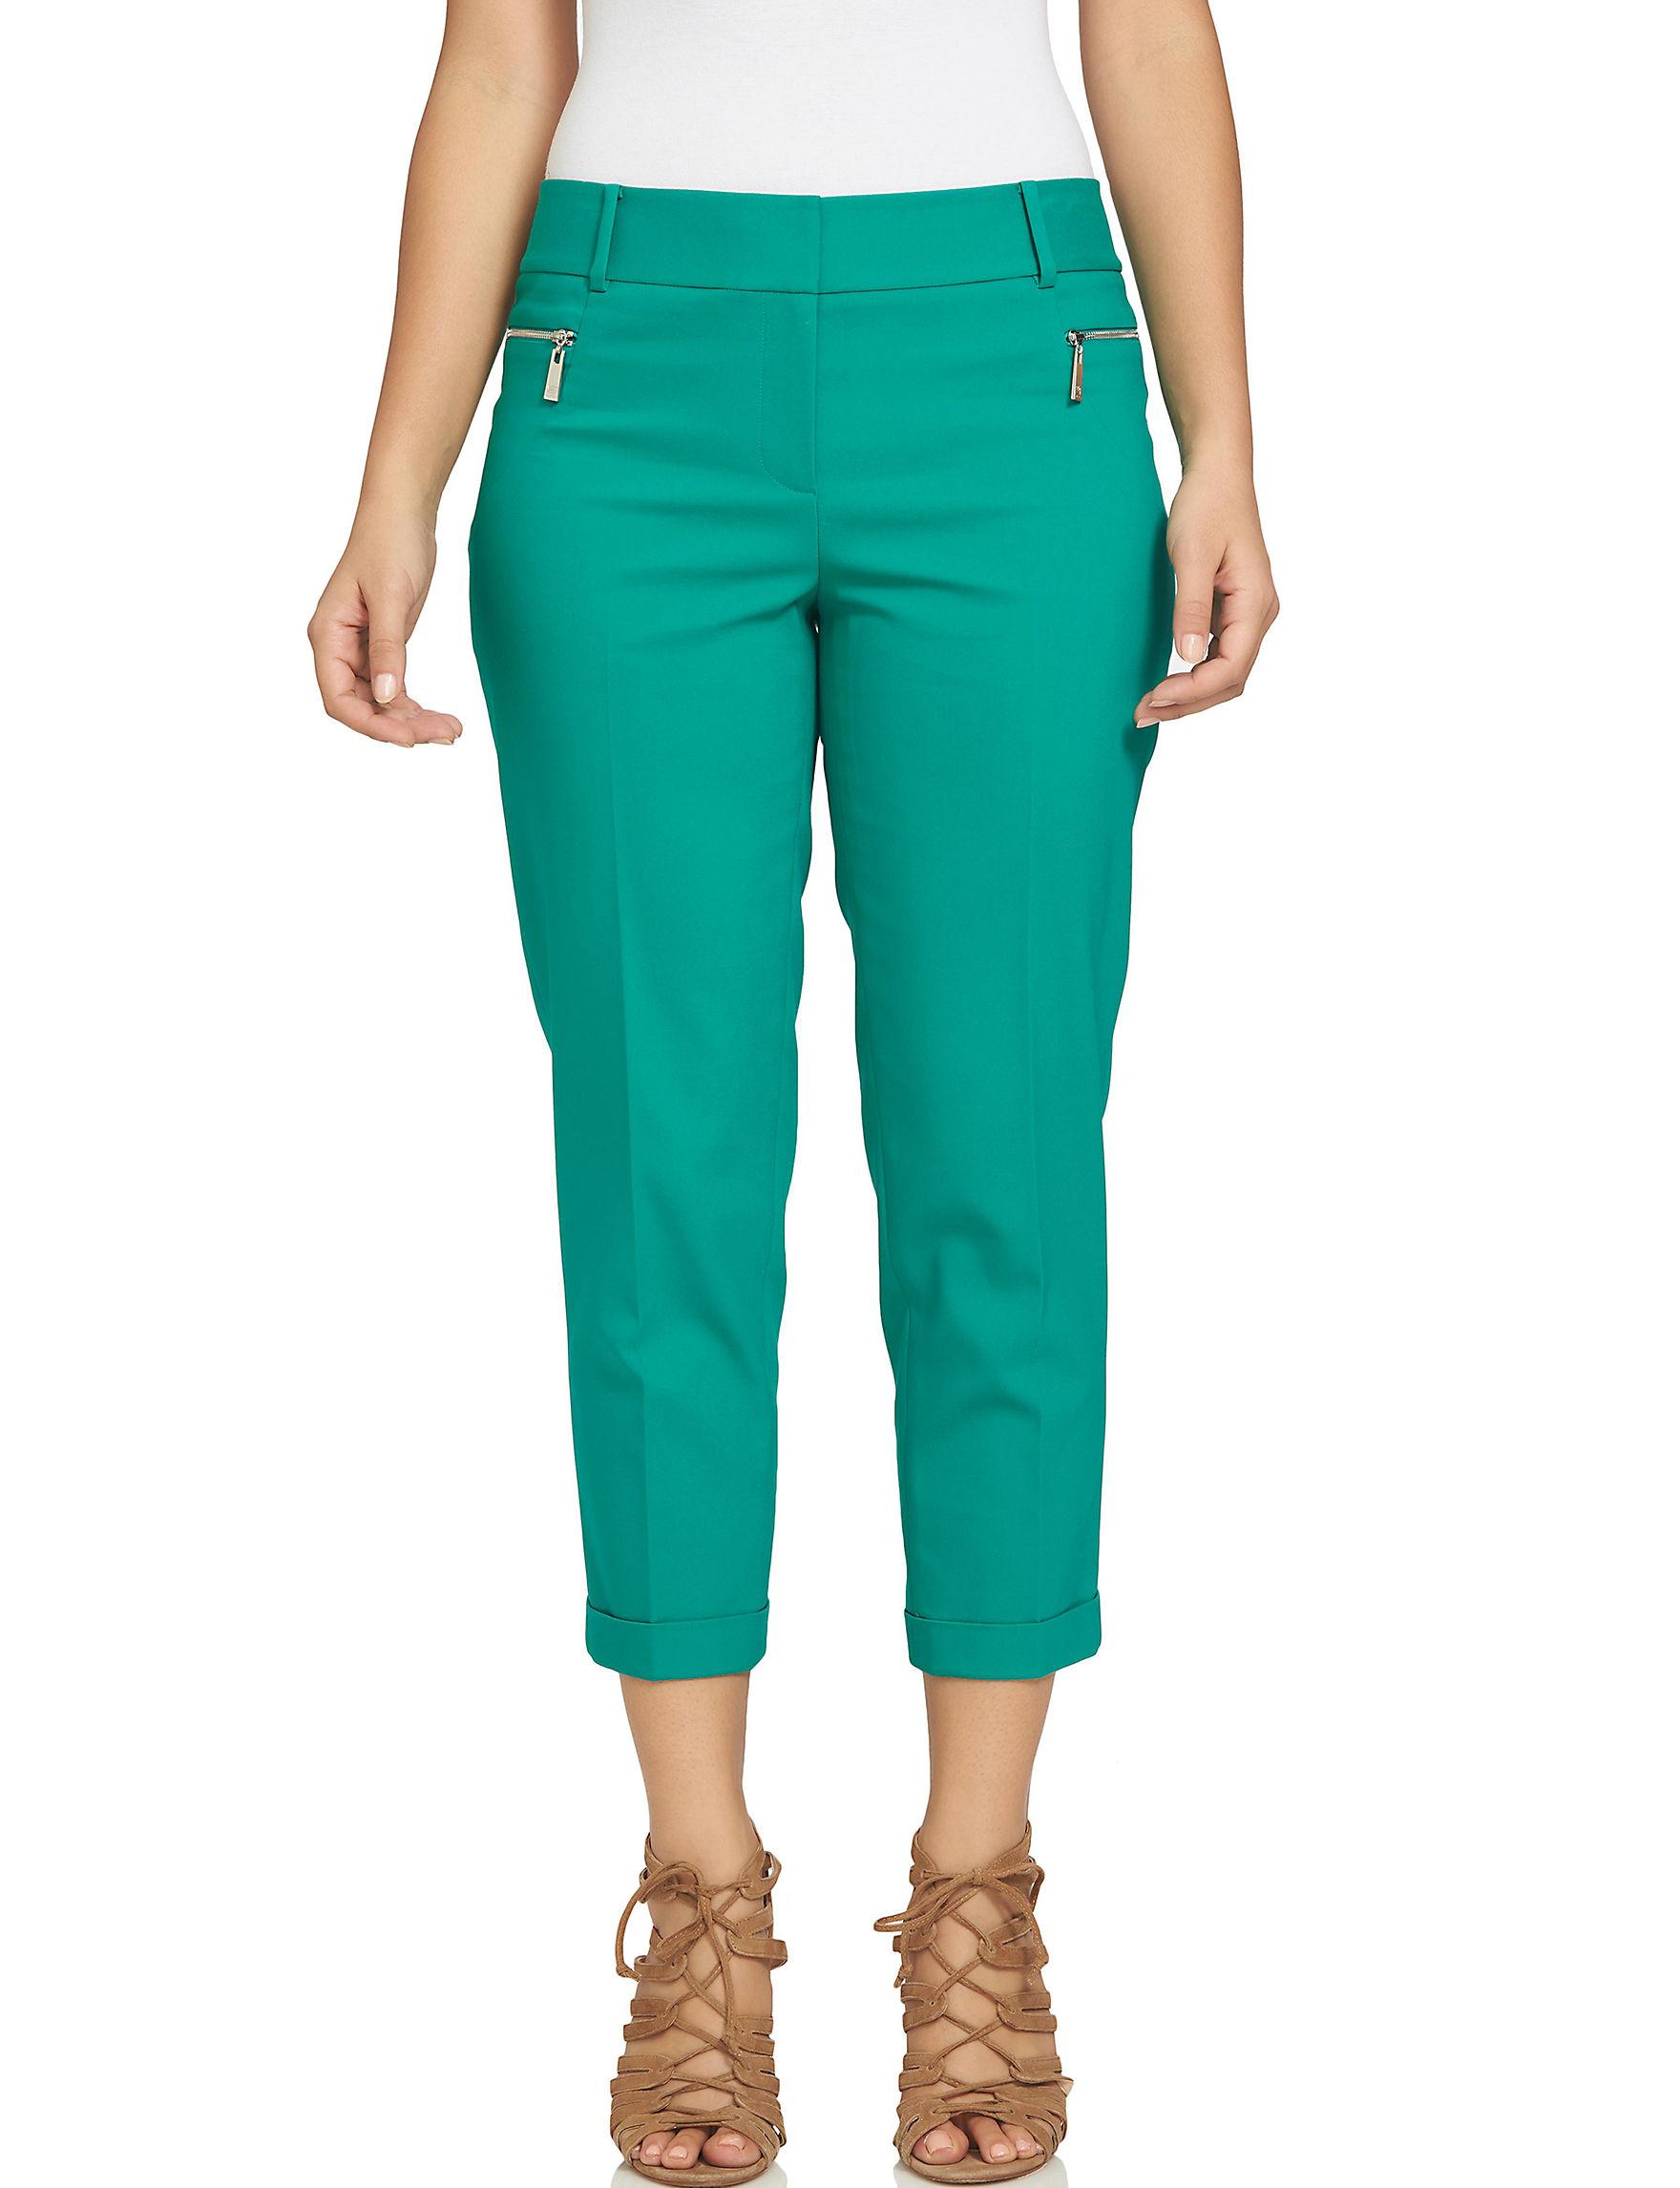 Chaus Green Soft Pants